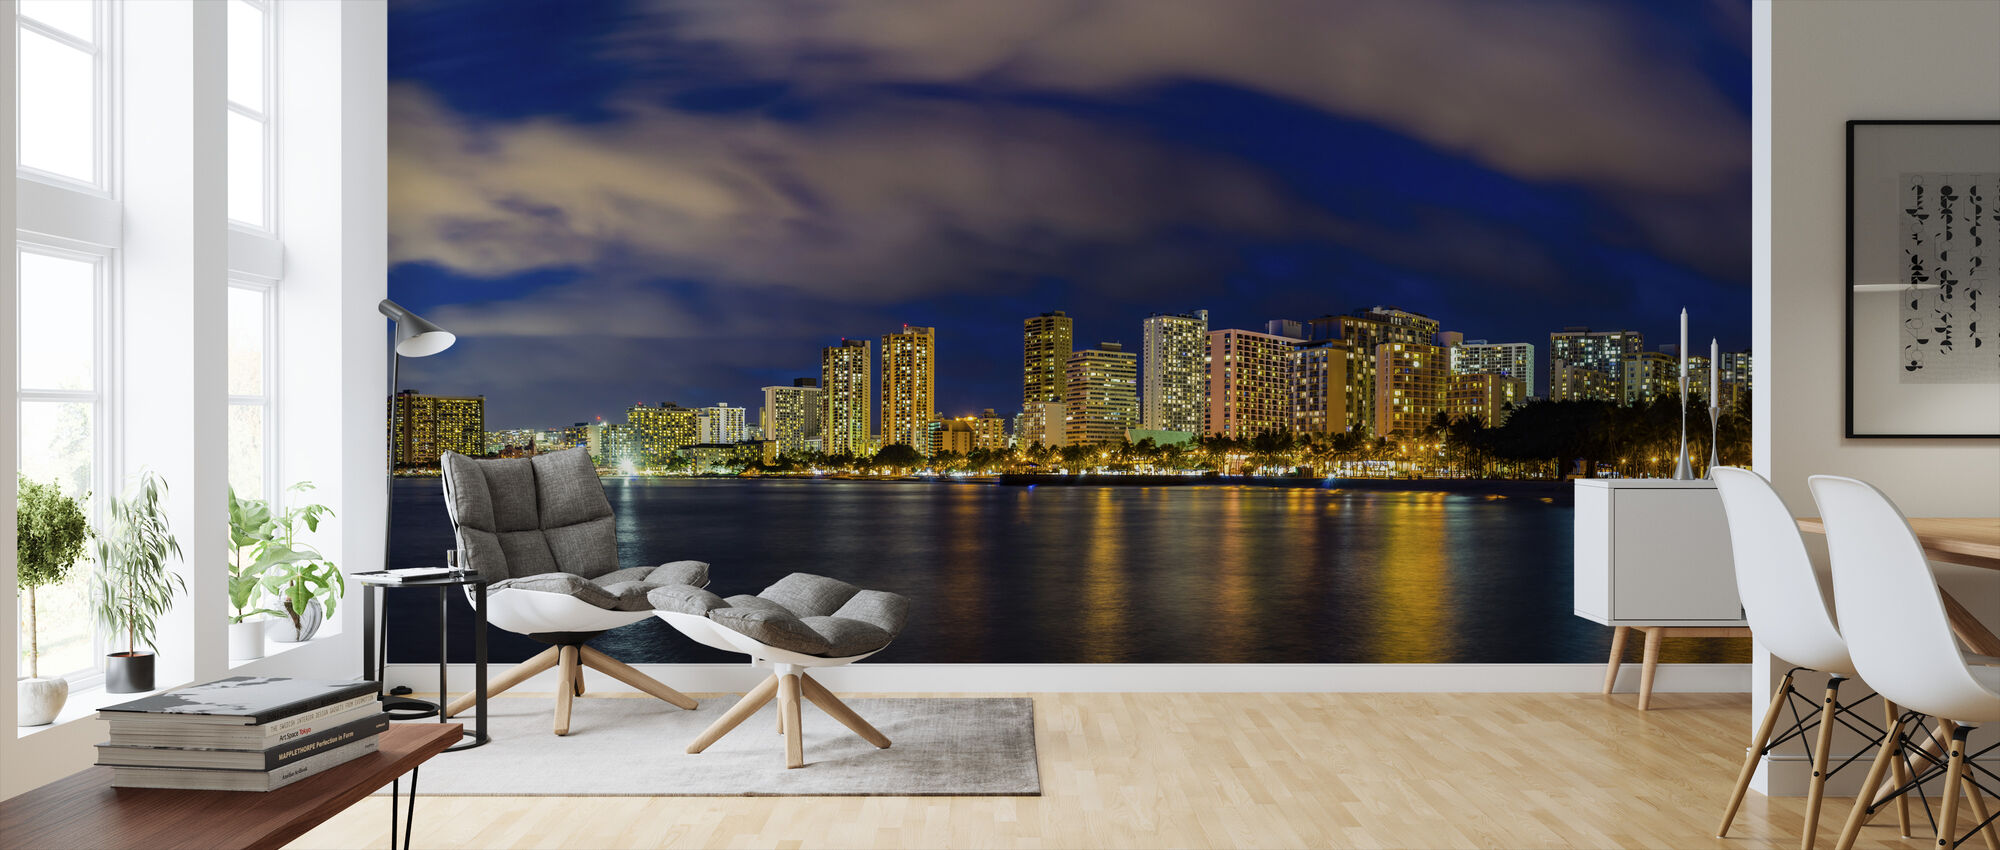 Honolulu Lights - Wallpaper - Living Room